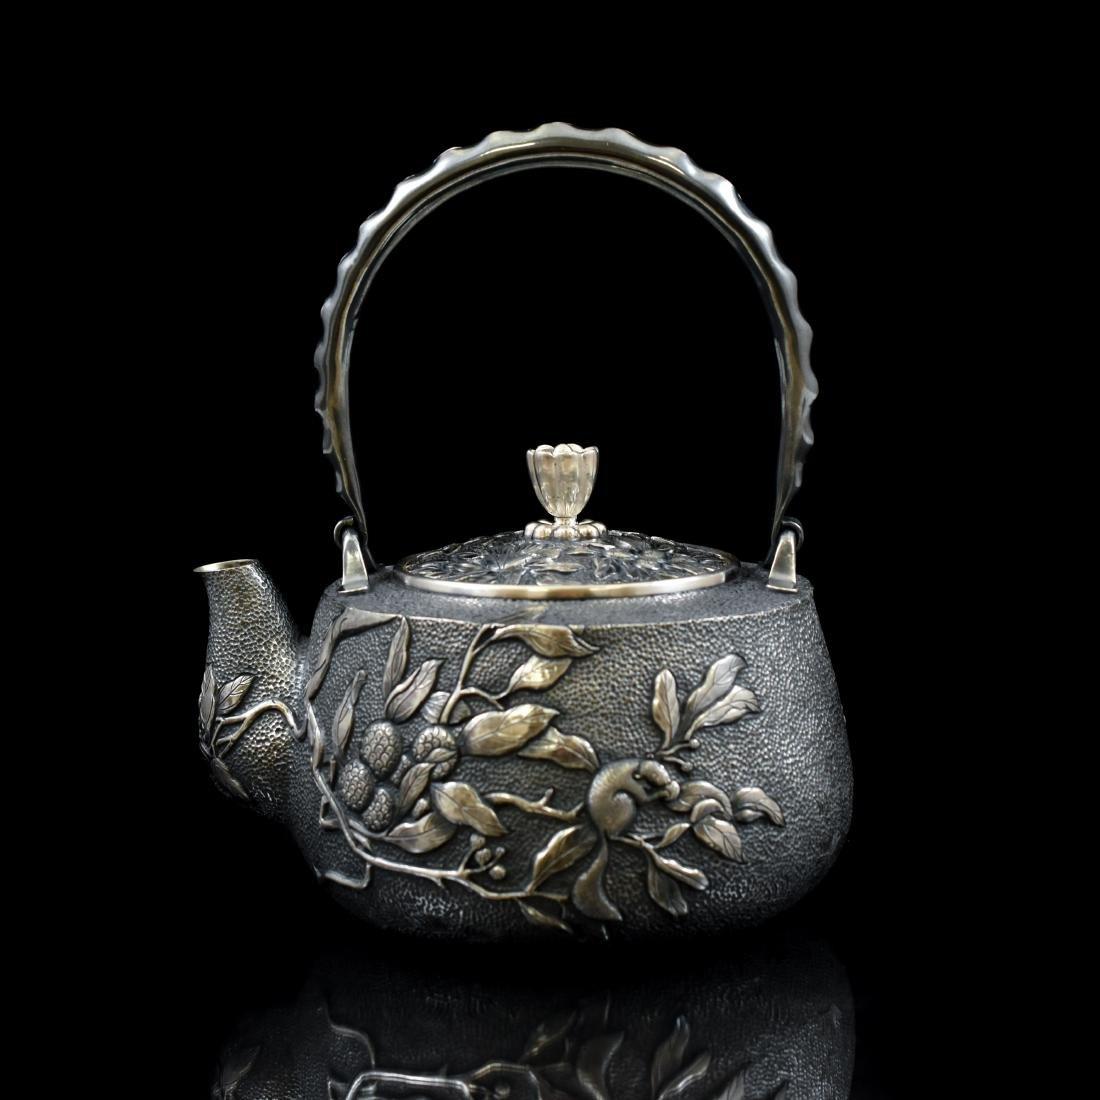 JAPANESE SILVER TEA POT WITH SQUIREL & FRUIT MOTIF